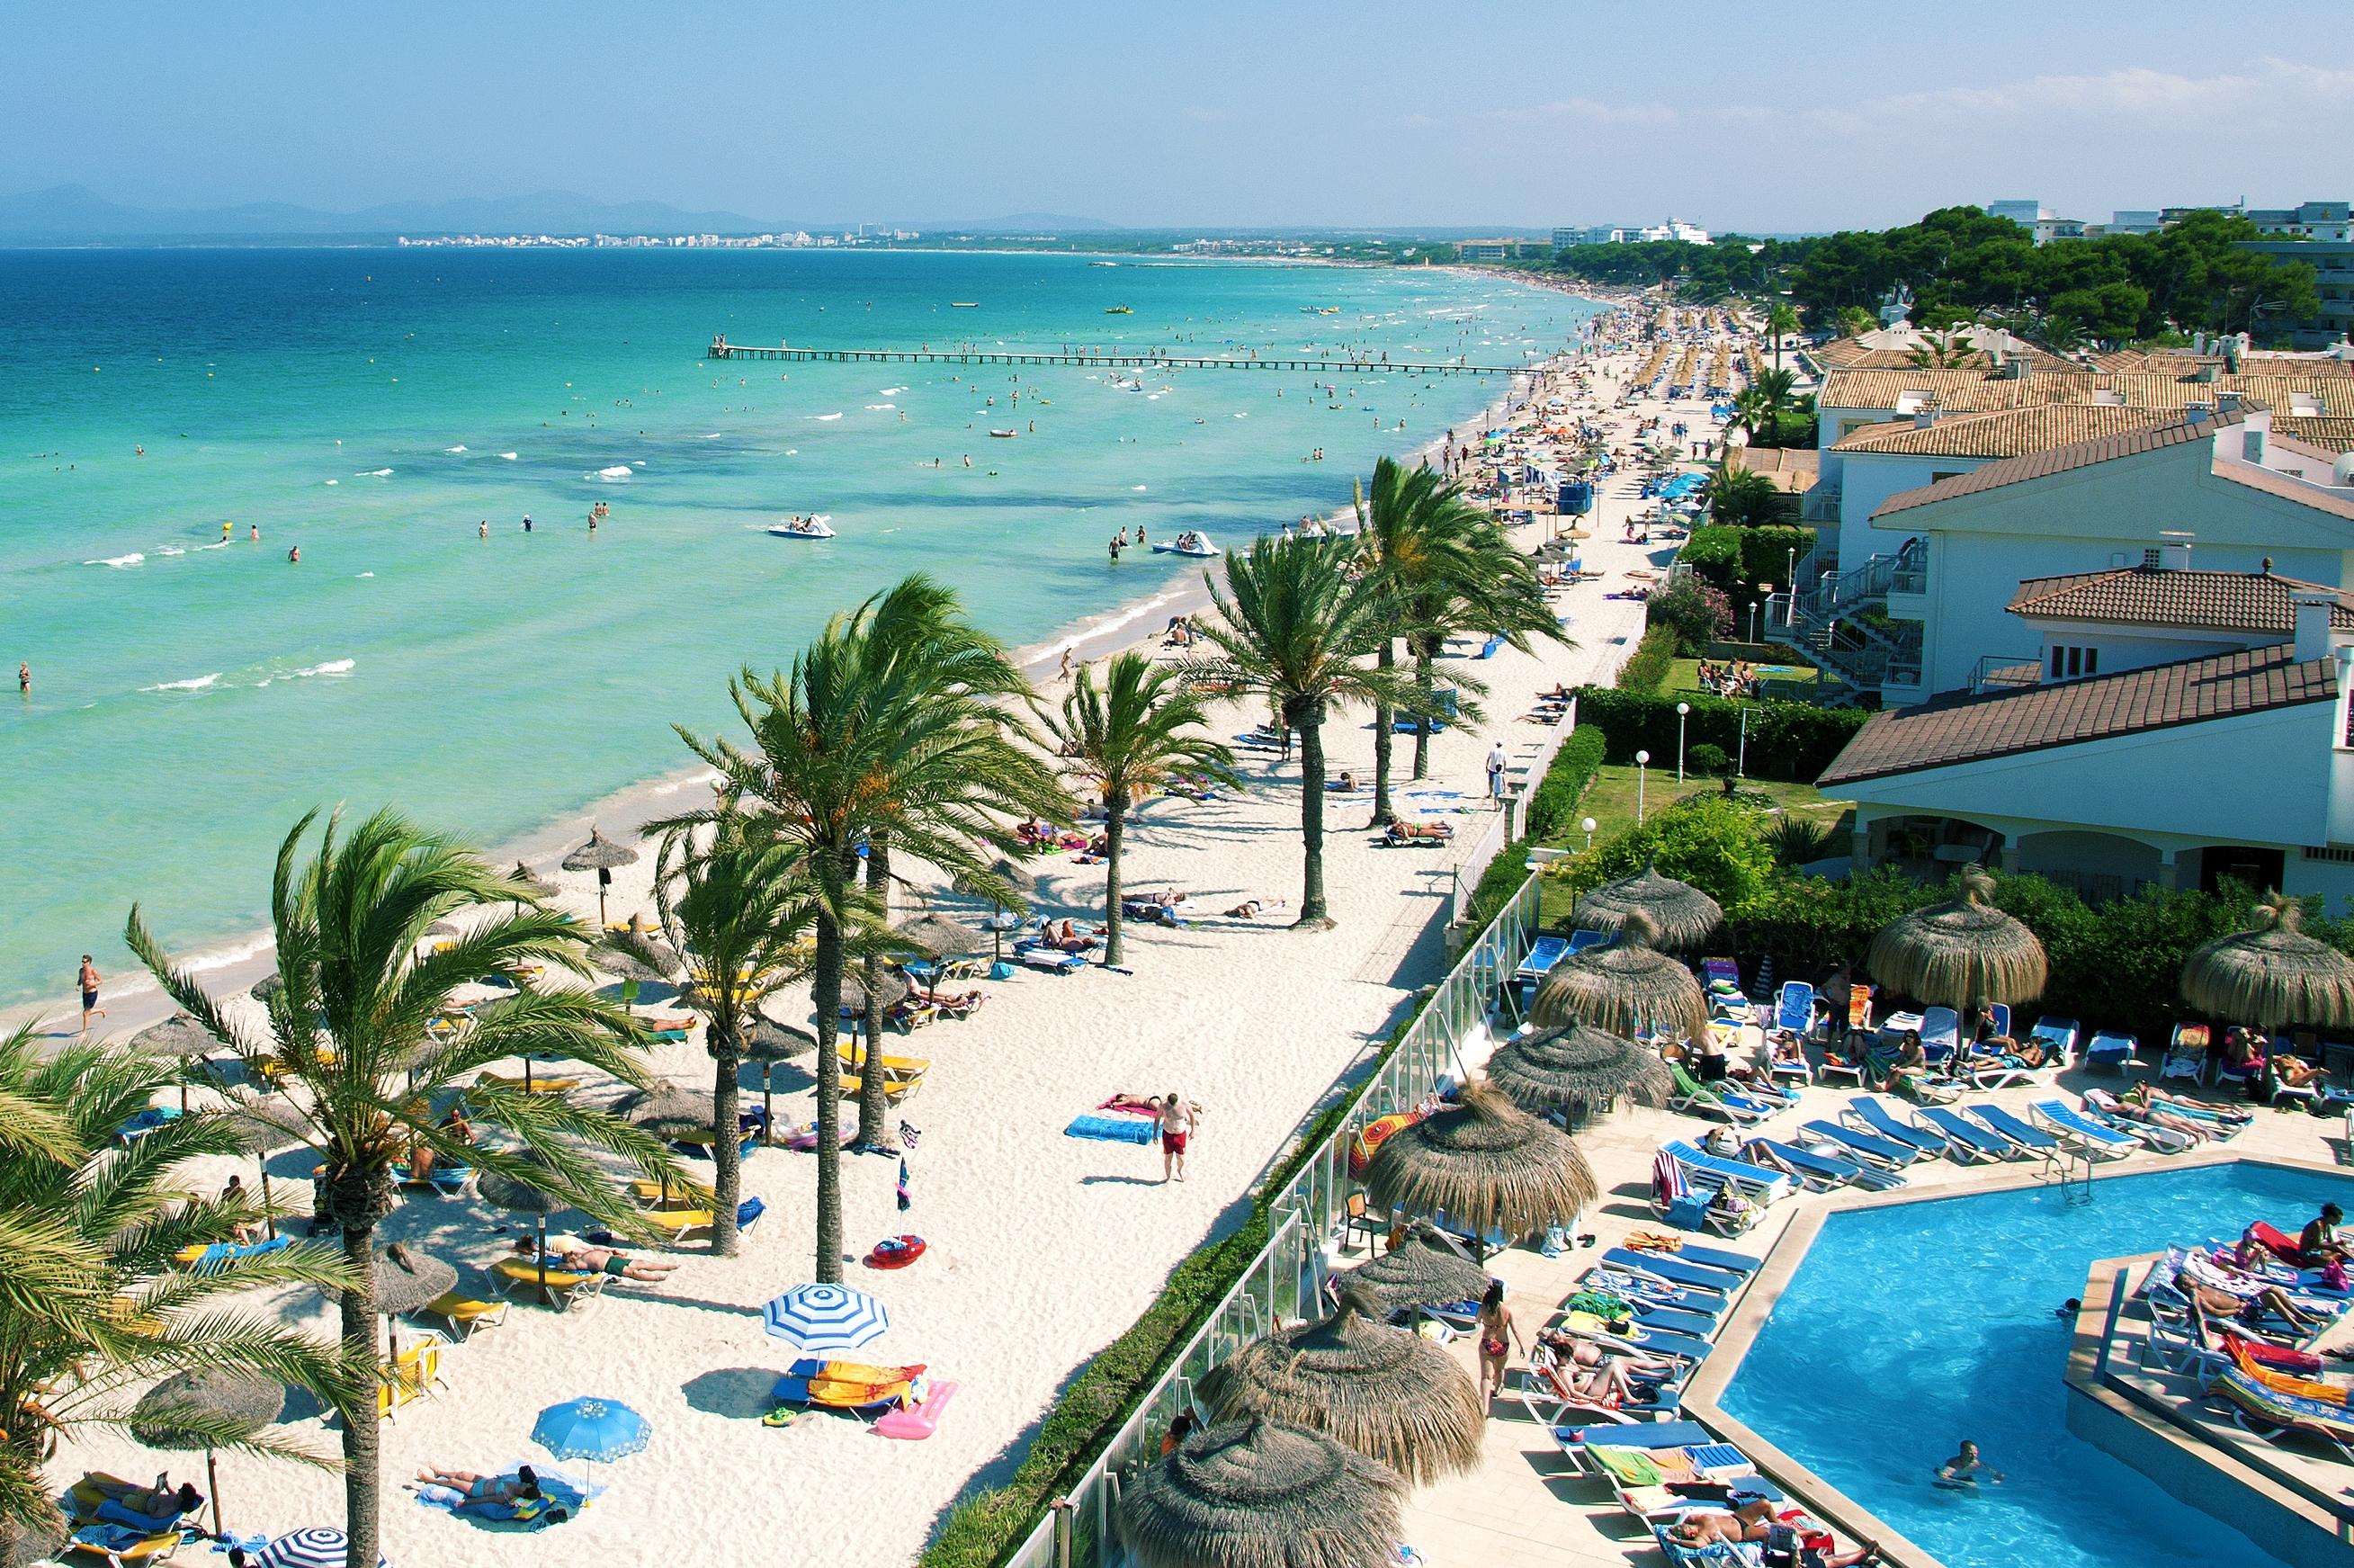 Strandene på Mallorca er et sikkert trækplaster for blandt andet charterturister. Her er det fra Alcudia, Foto: Bravo Tours.